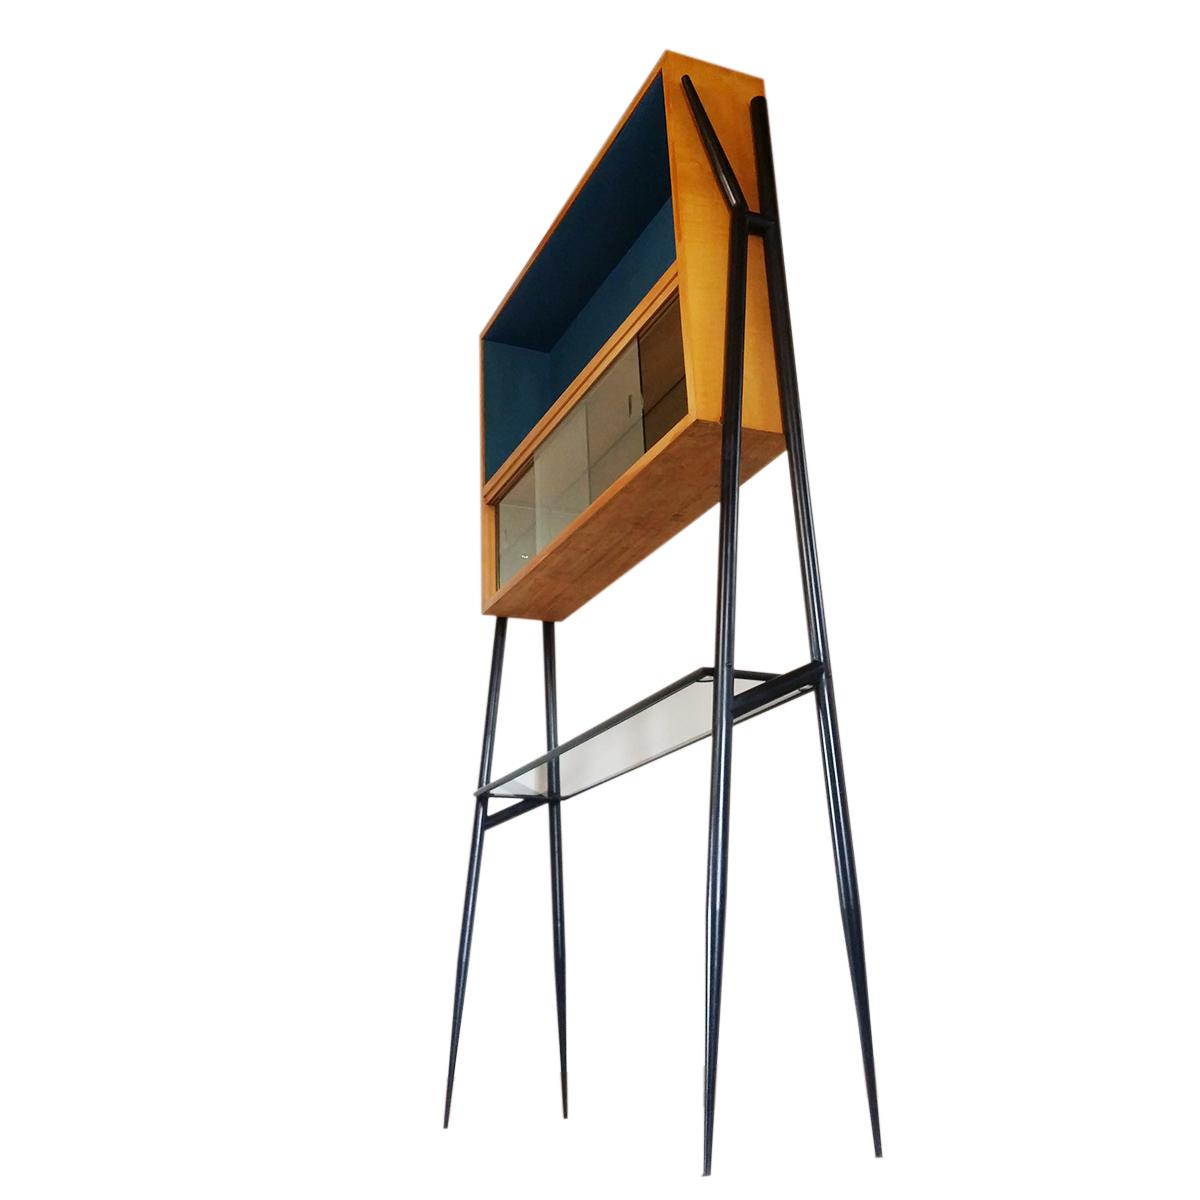 cabinet-compass-feet-bar-console-vintage-italian-gio-ponti-